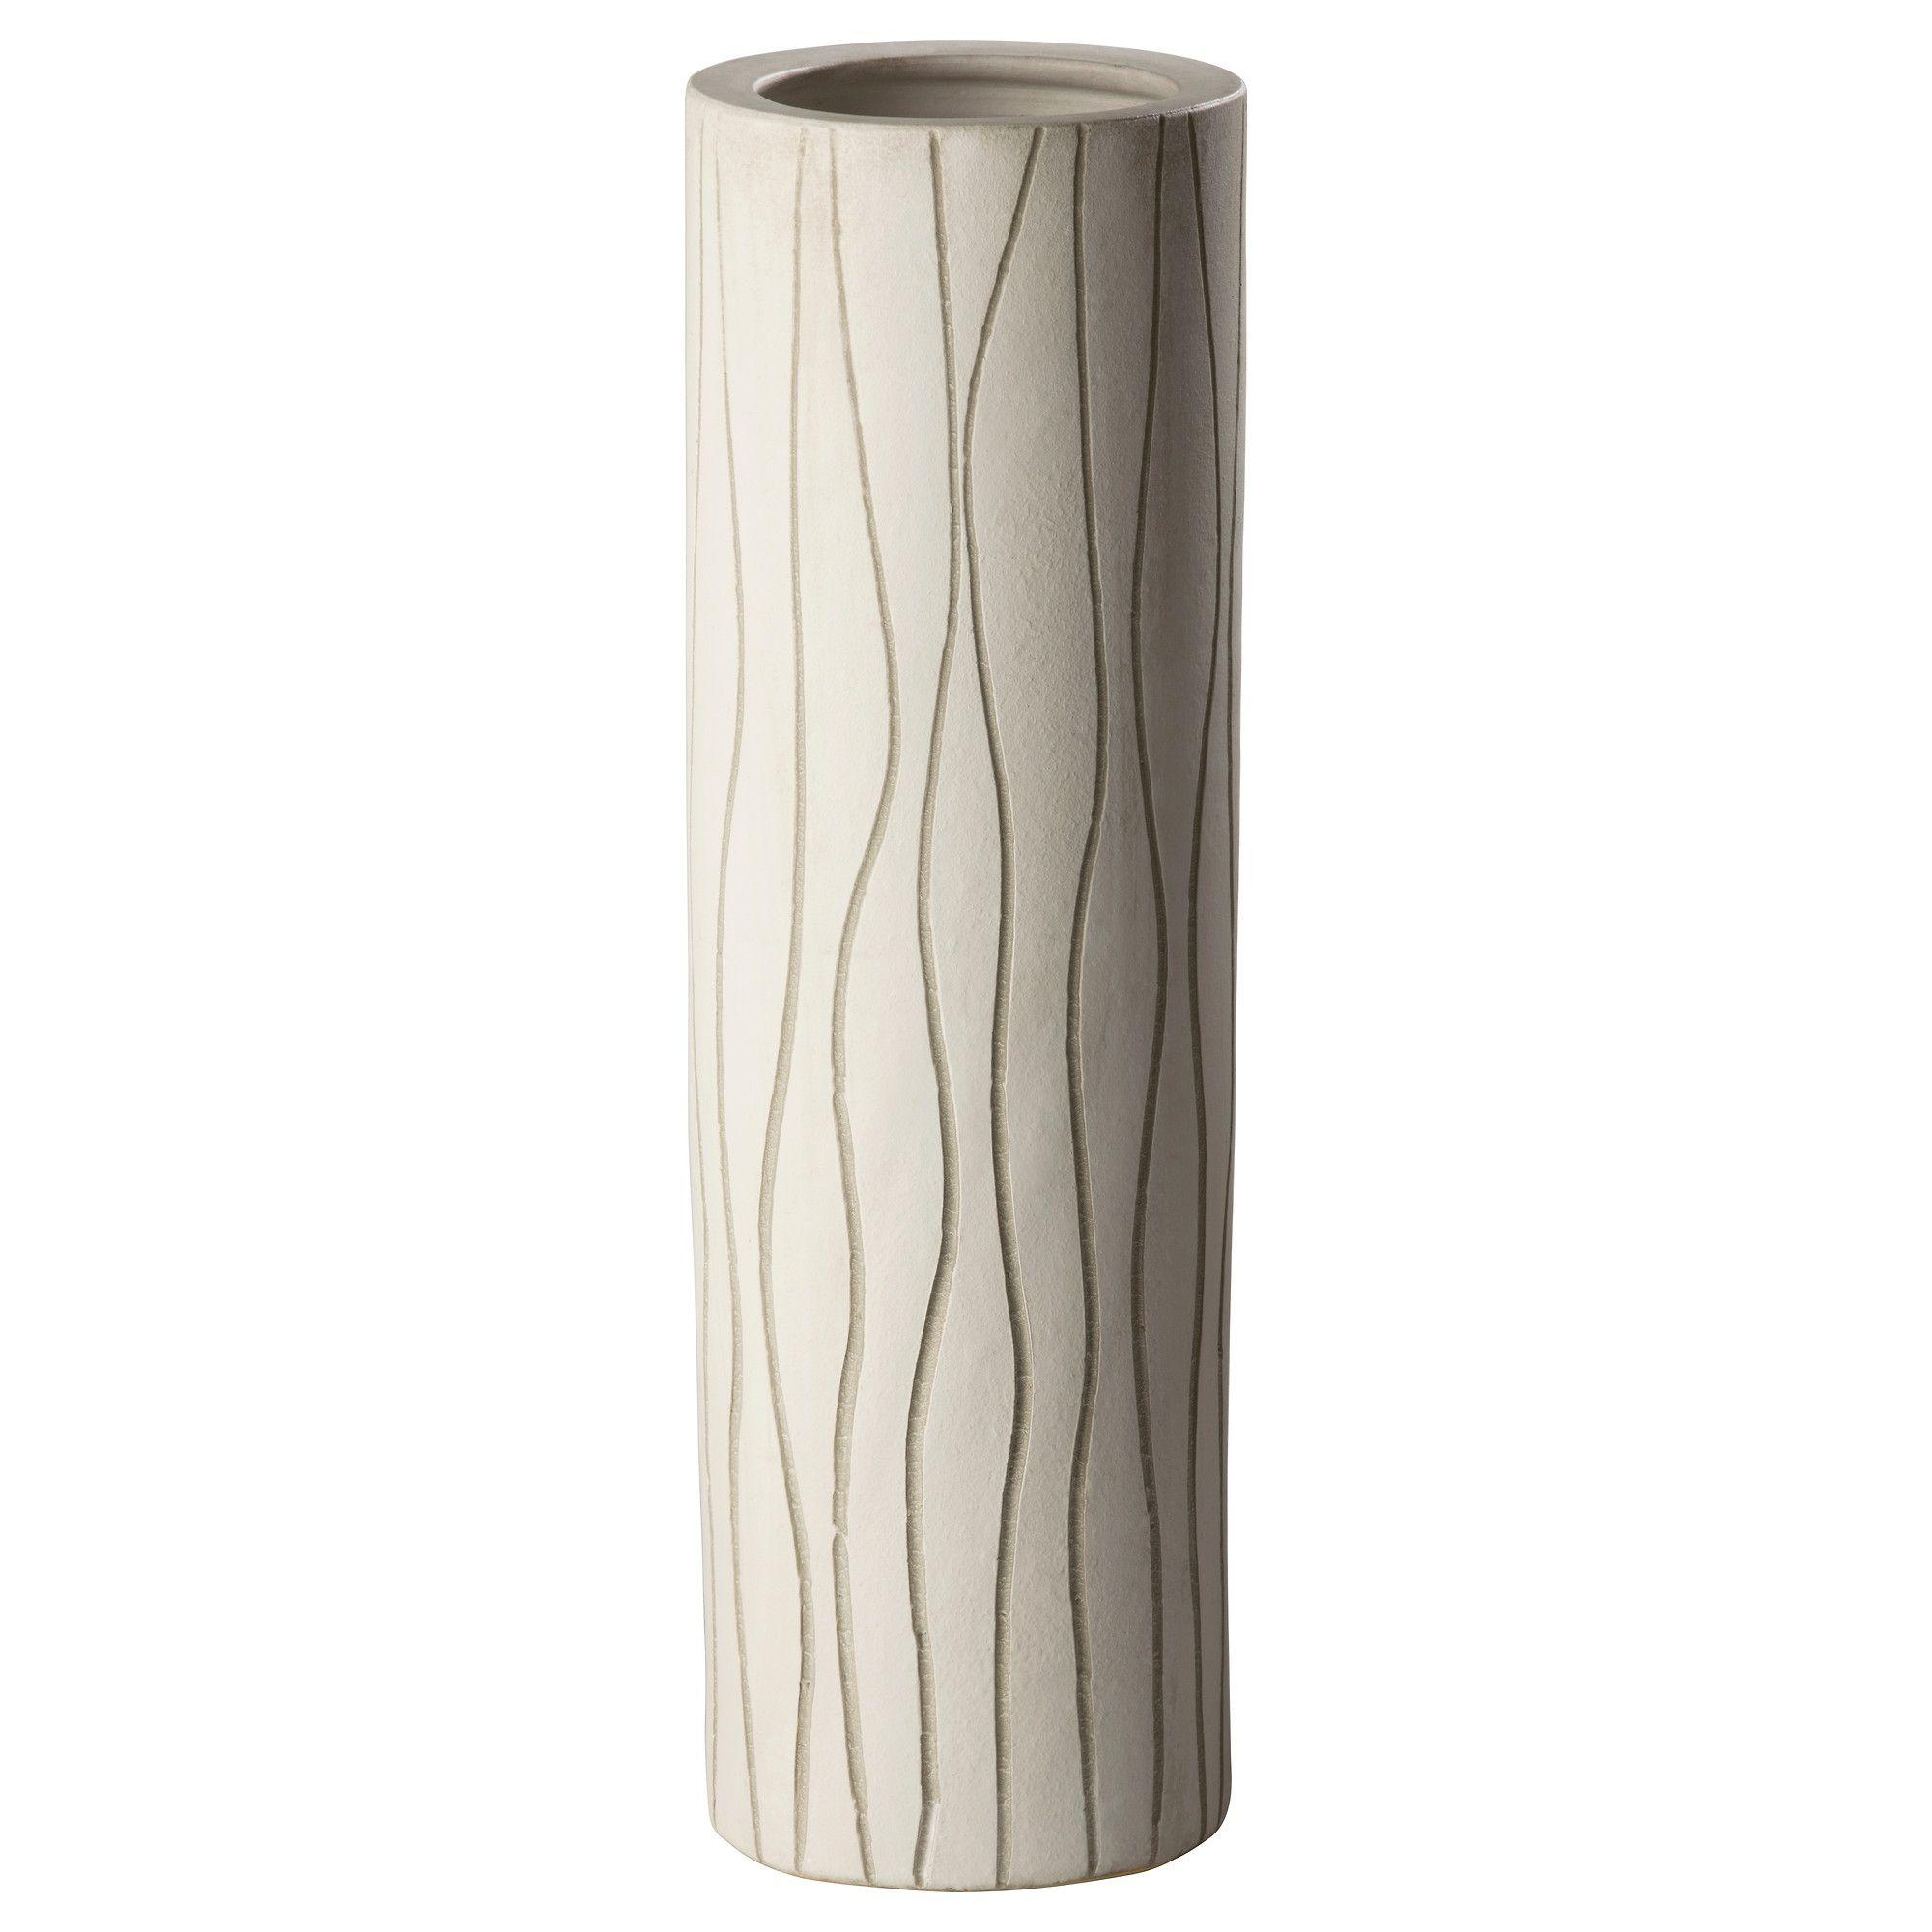 Fredl S Vase  Ikea $1999 I Chose This For